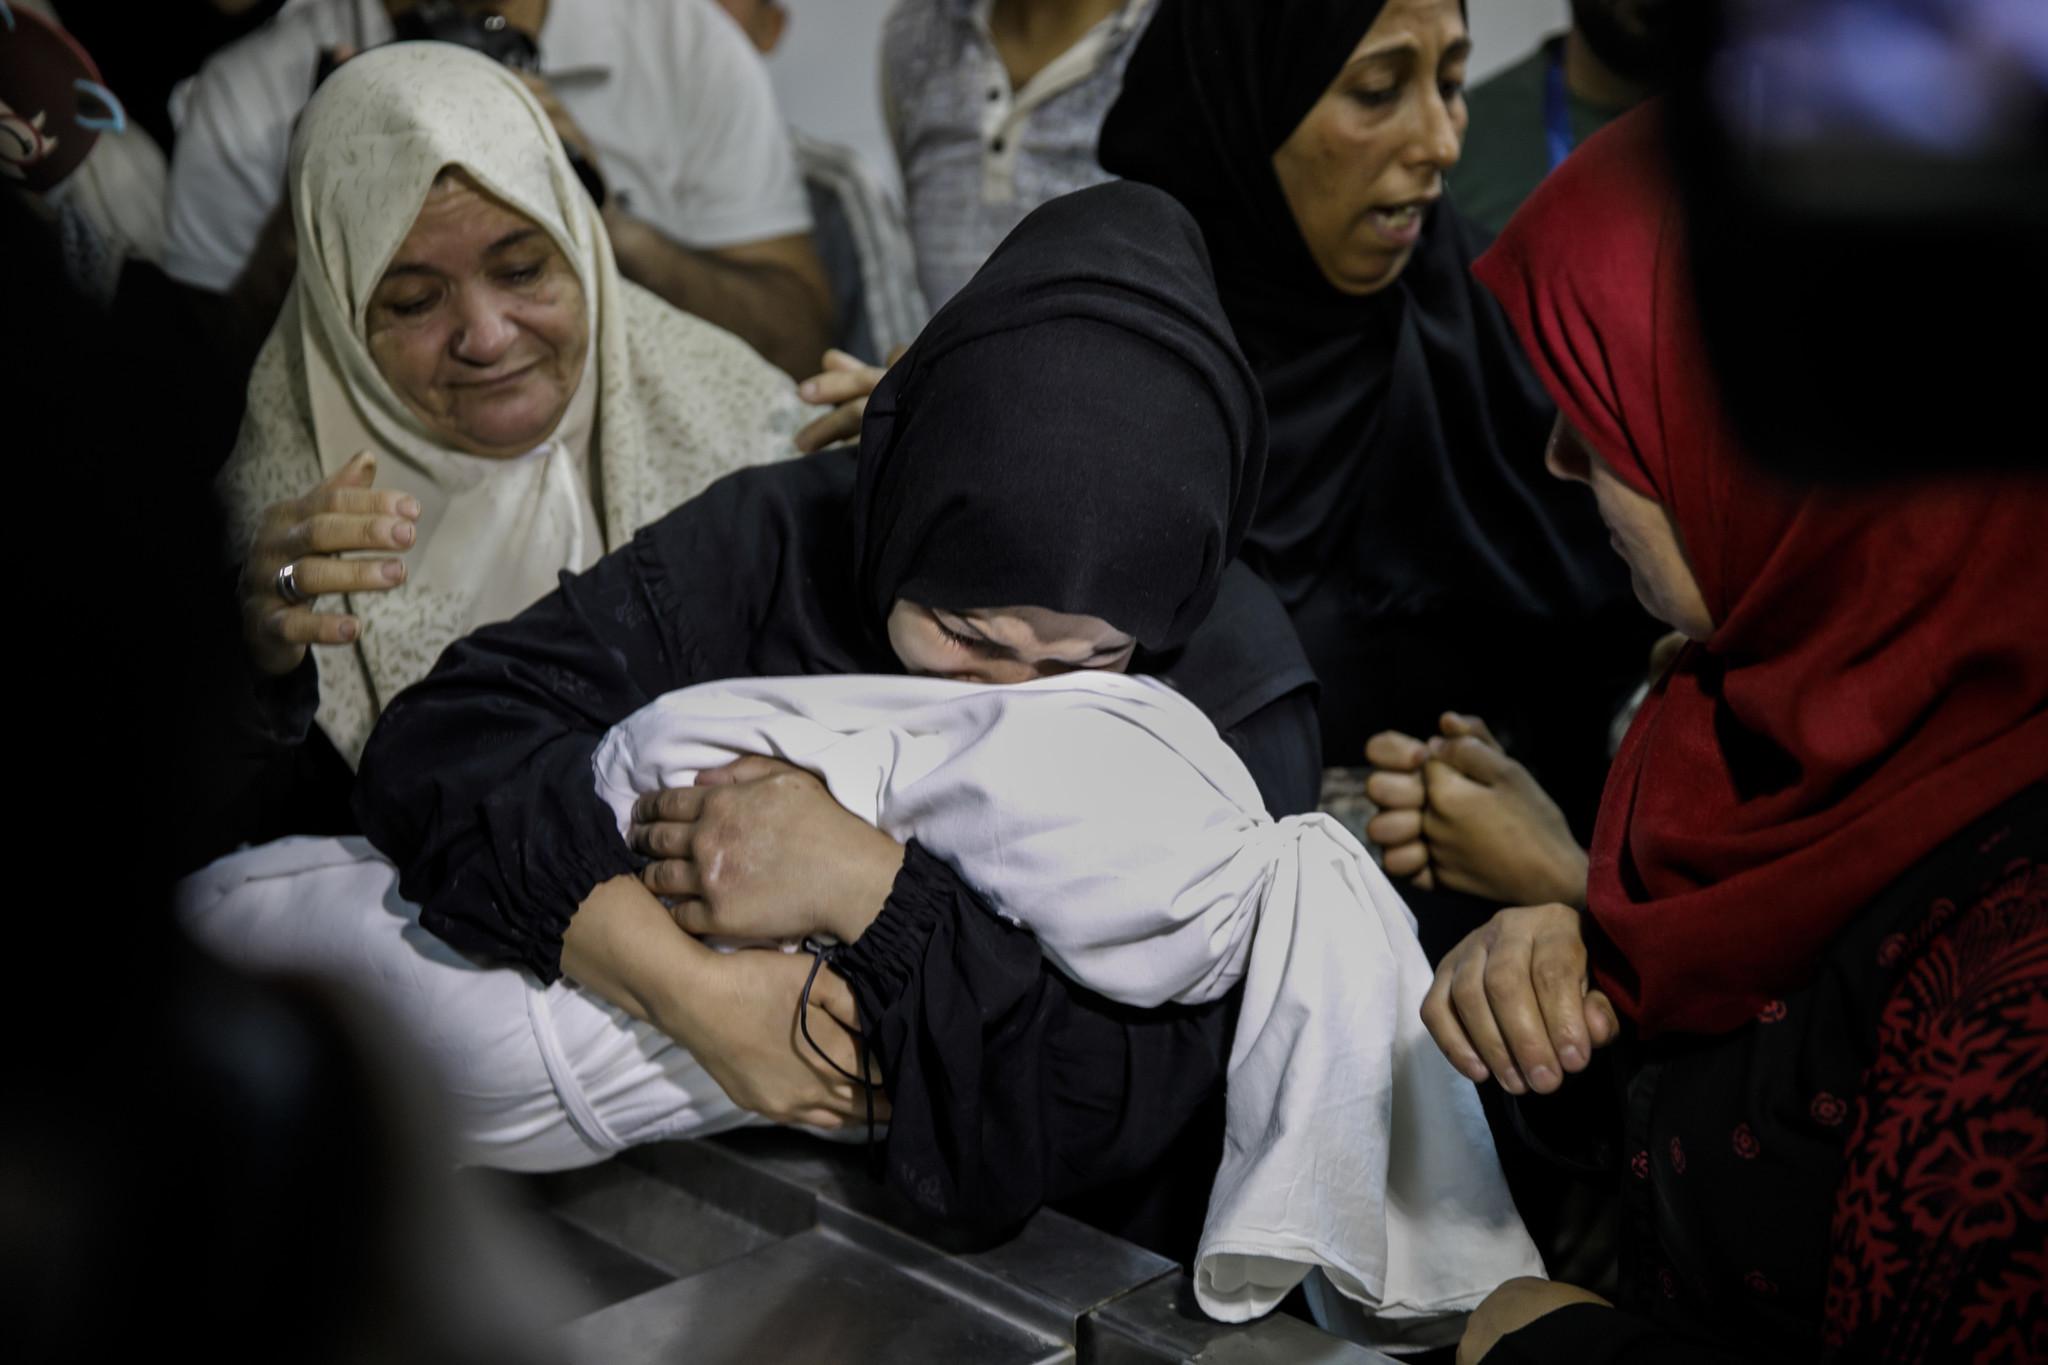 GAZA CITY, GAZA — TUESDAY, MAY 15, 2018: Mariam Mahmud Ahmed Ghandour, mourns her child, Laila Anwa